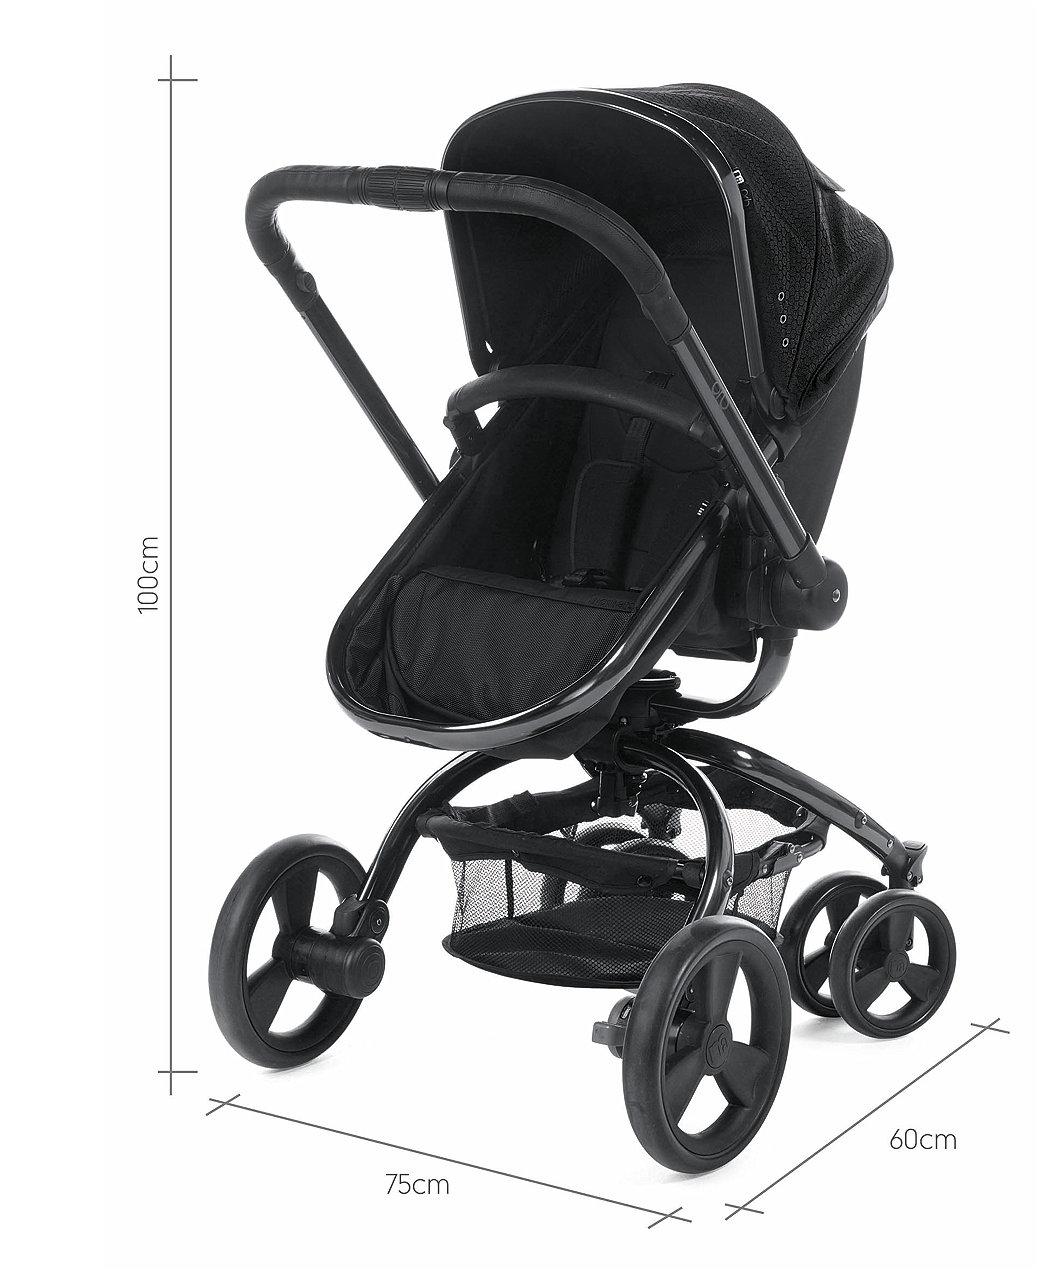 Mothercare Orb Spin Rear Back Wheel black pram pushchair